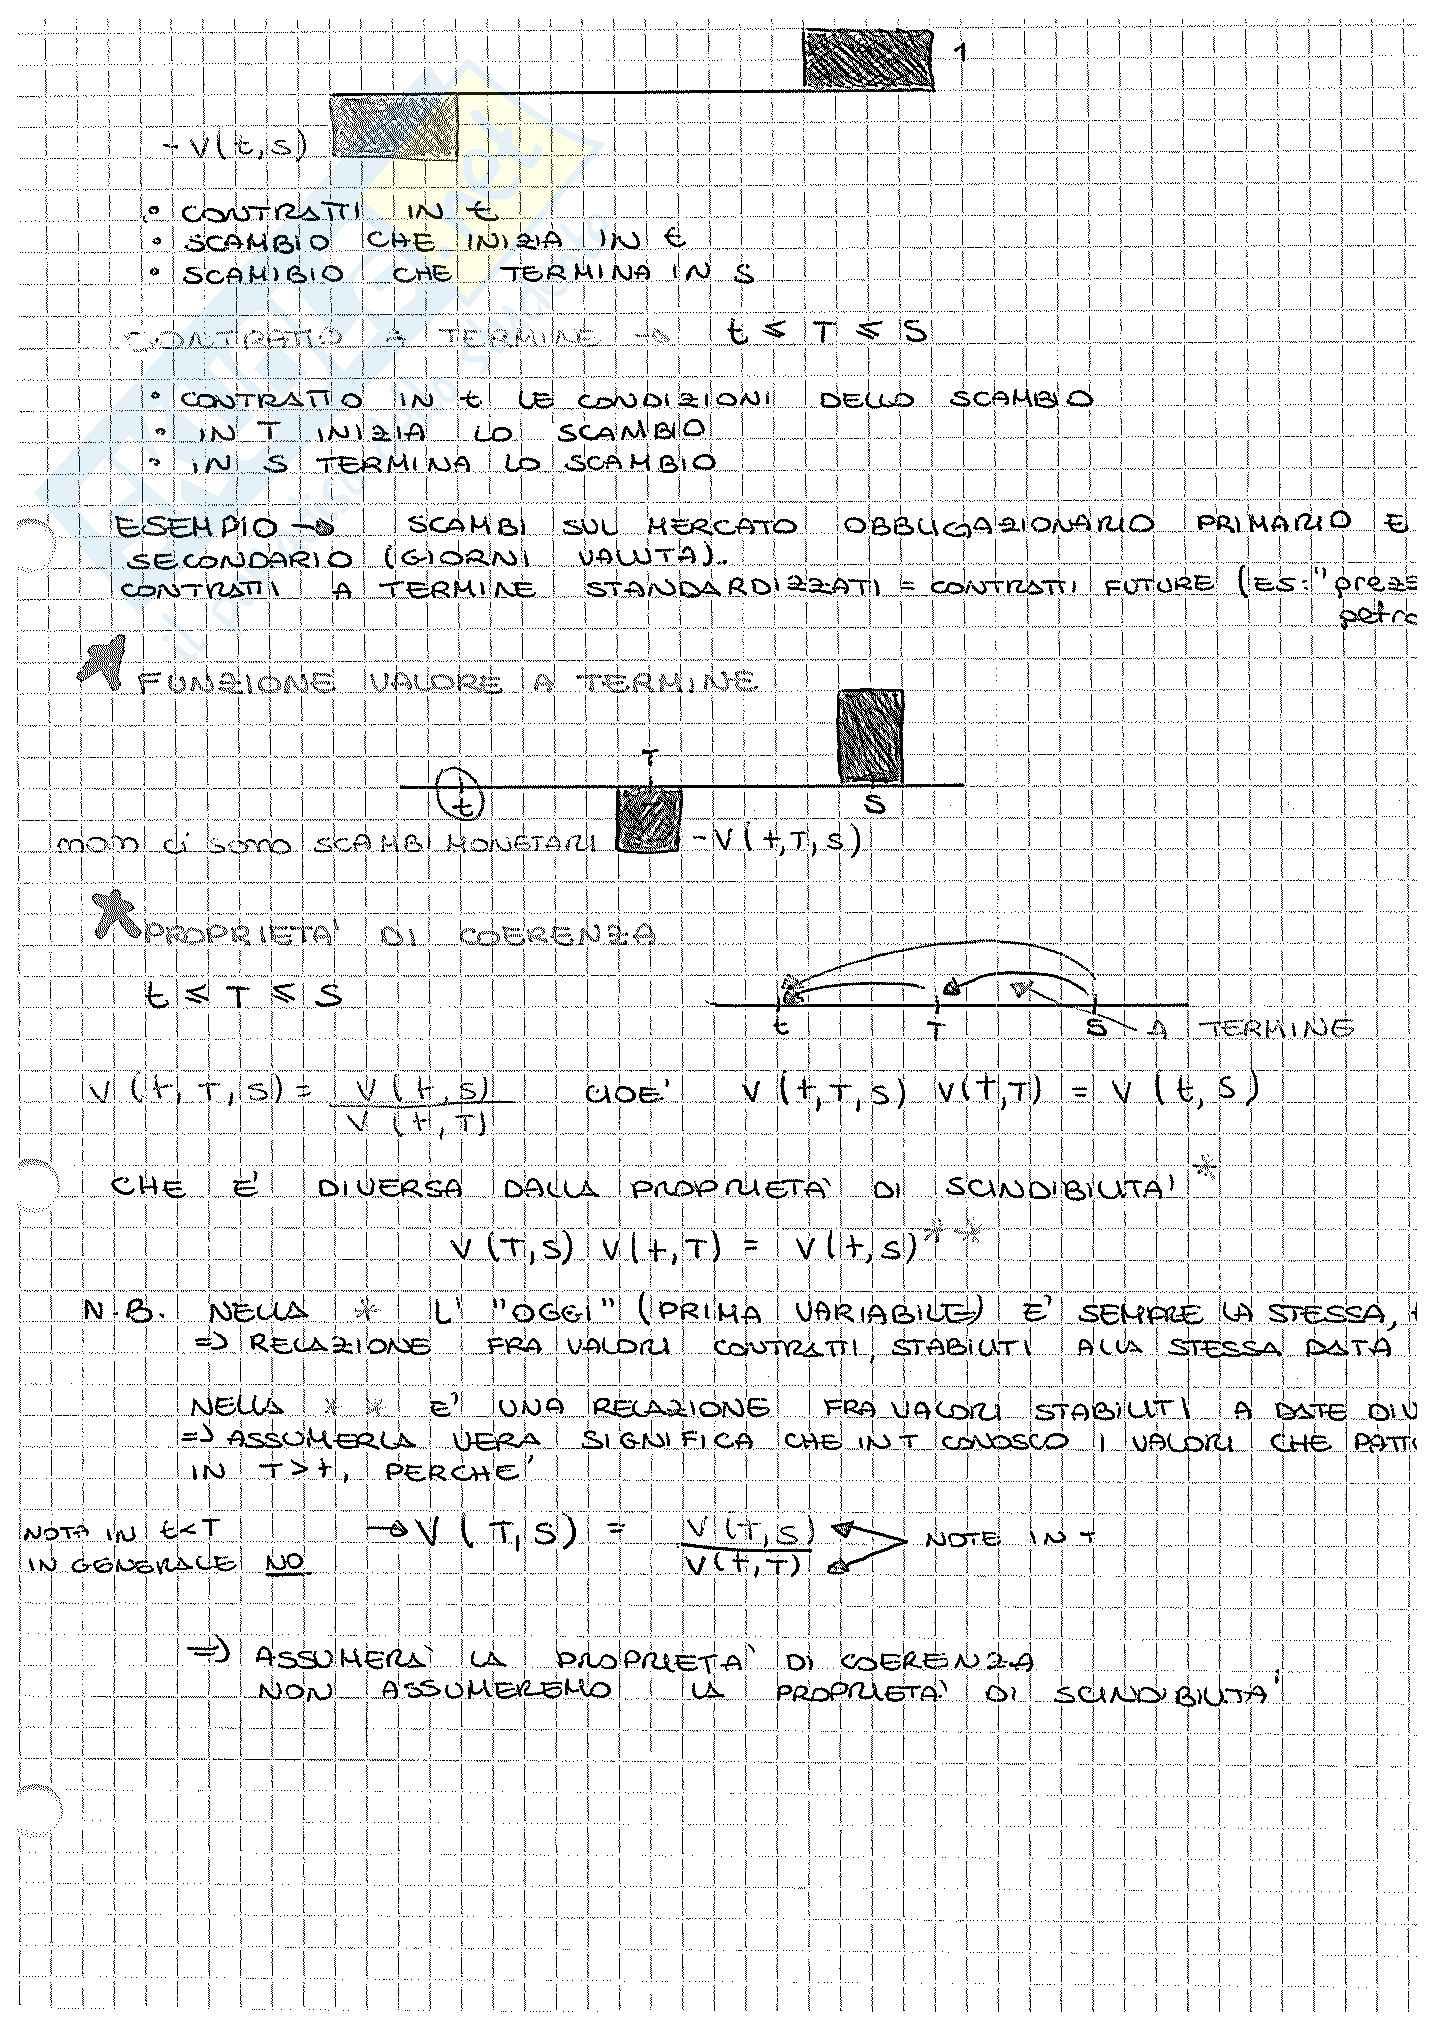 Appunti di Matematica Finanziaria, docente Claudio Pacati Pag. 51